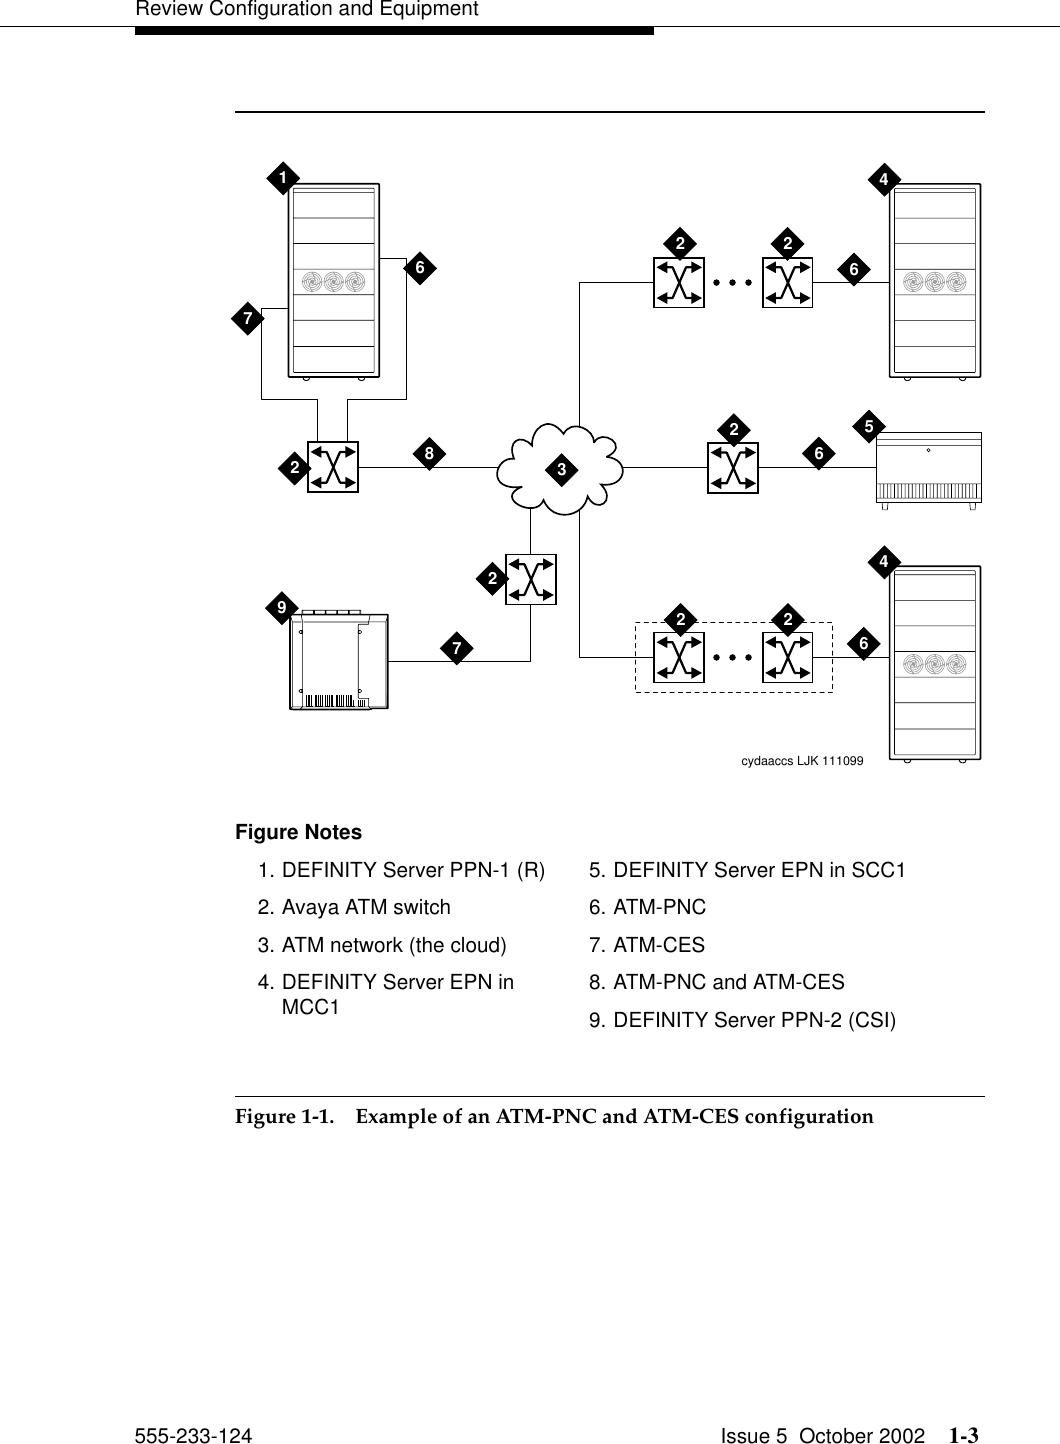 Rj45 loopback plug pinned 1-3 2-6 betting nyc off track betting